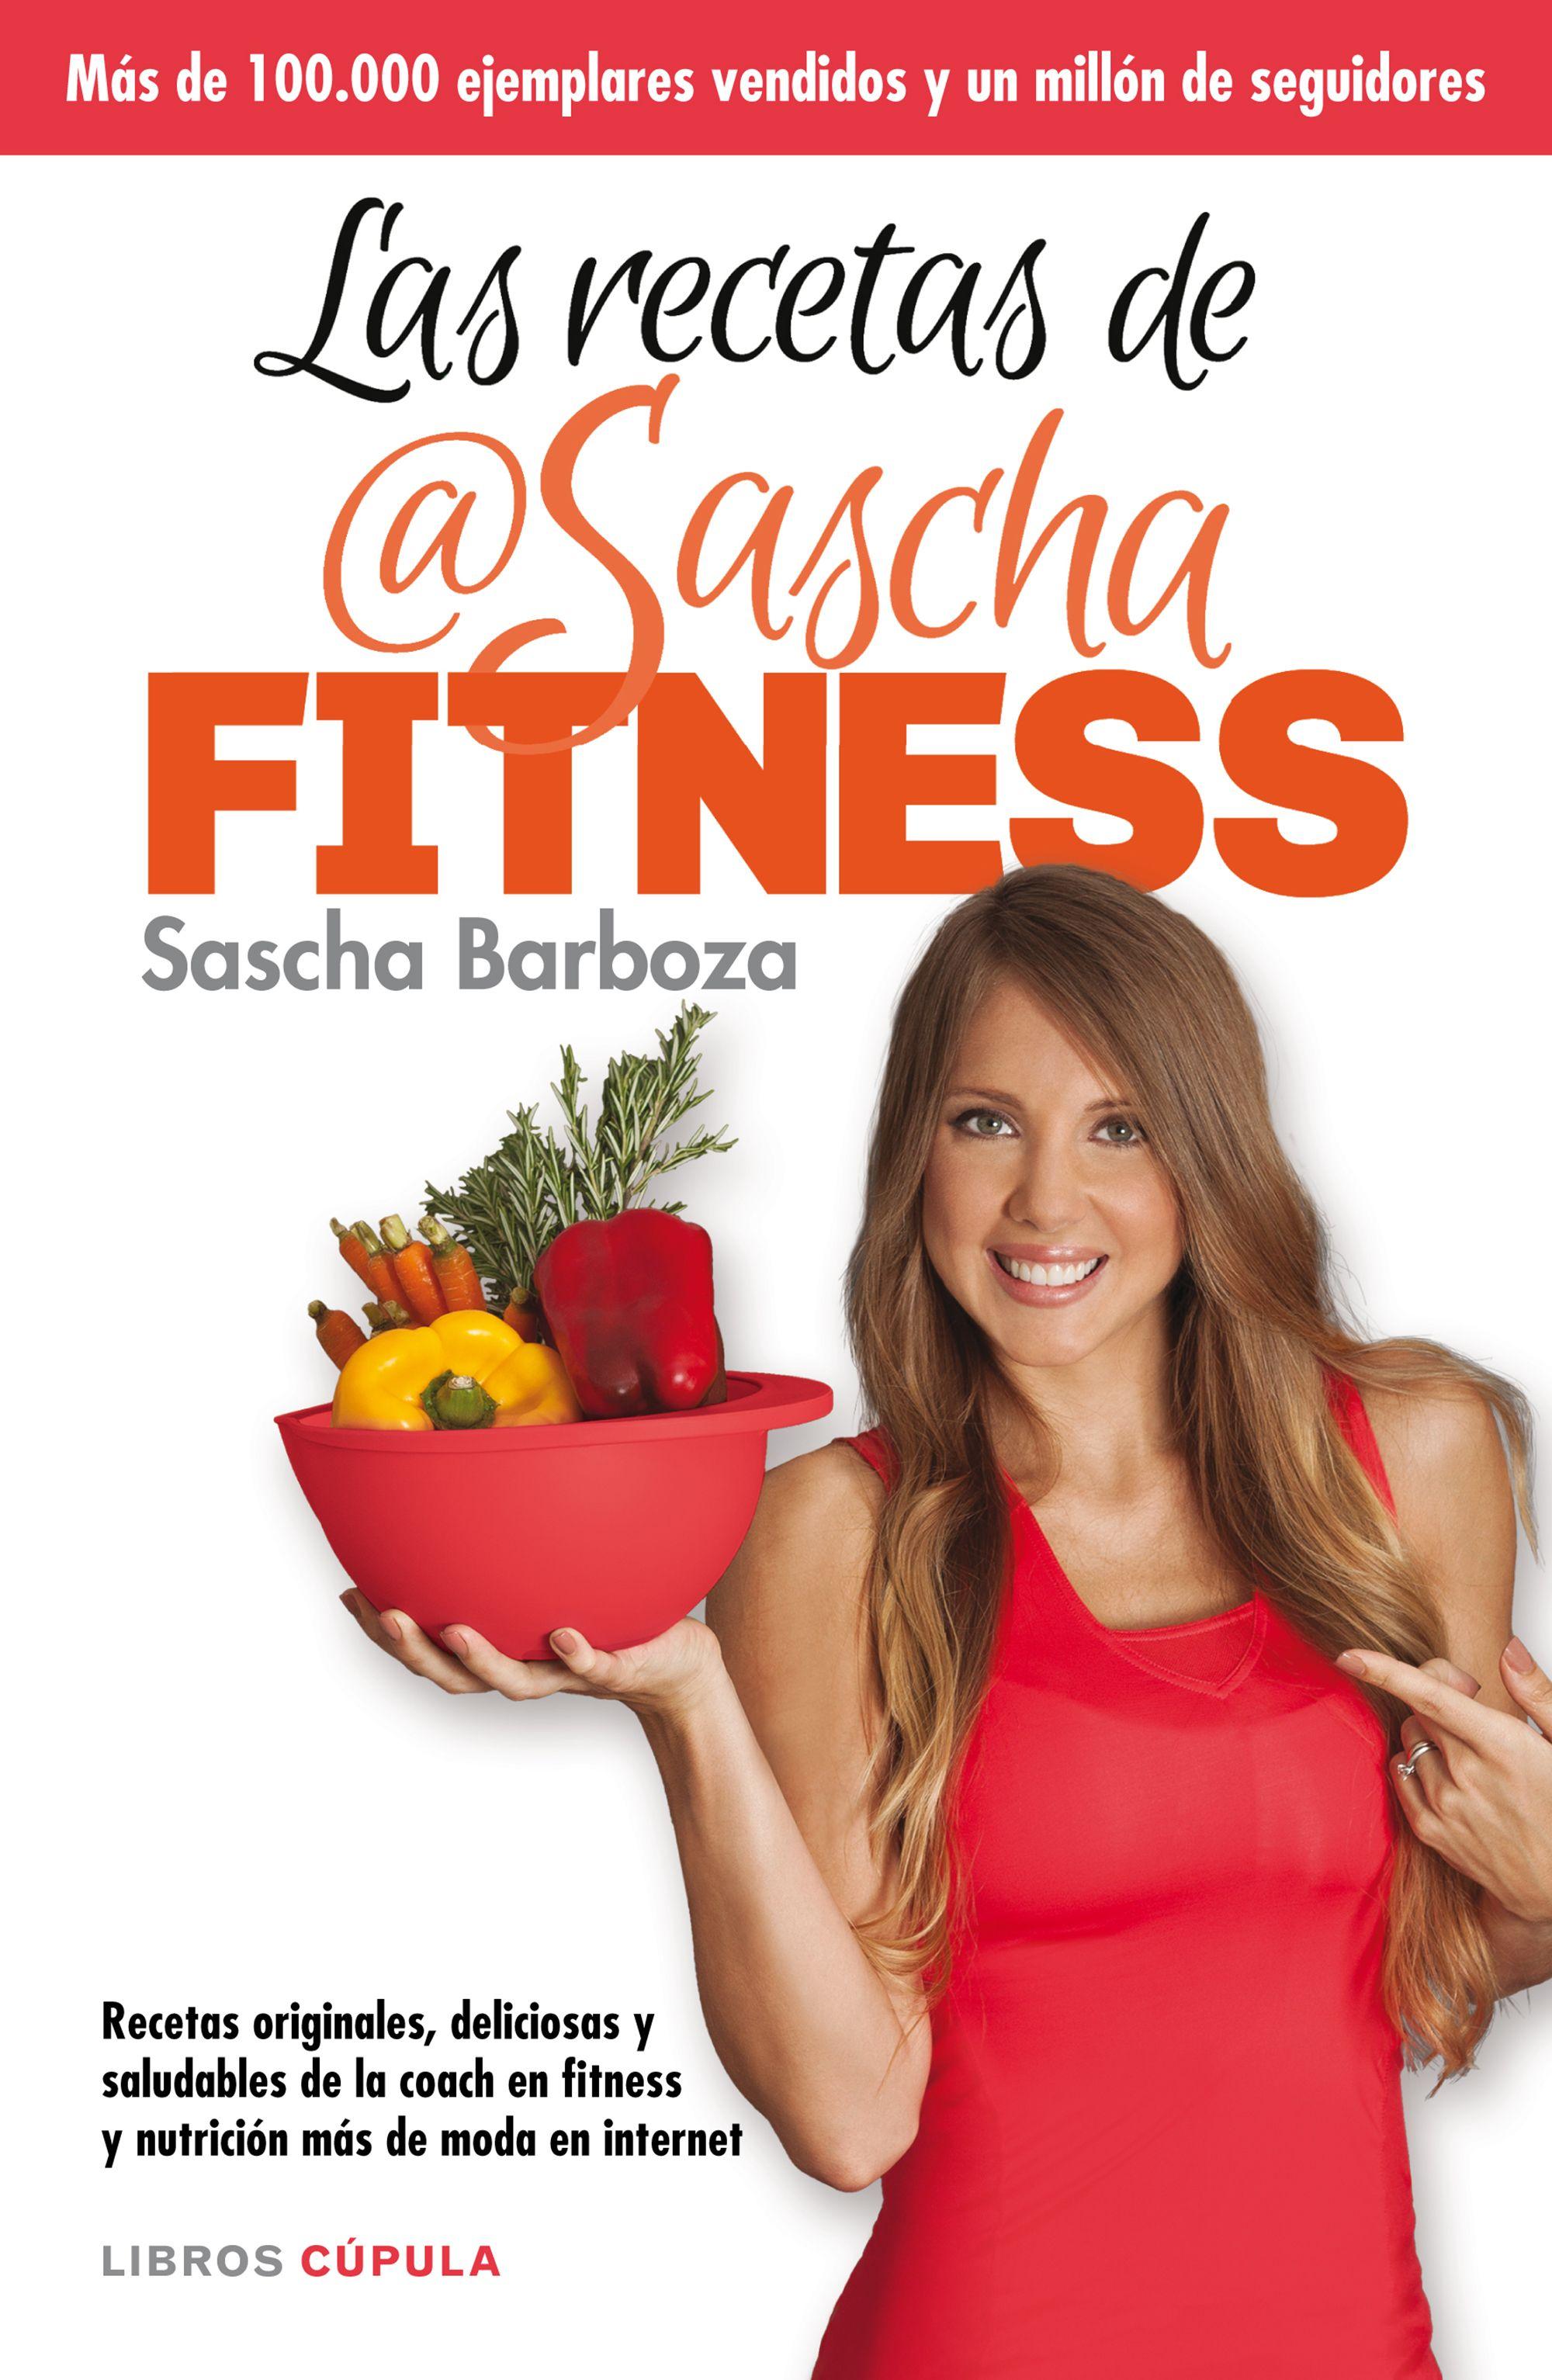 Las recetas de sascha fitness planeta de libros barboza sascha fandeluxe Images